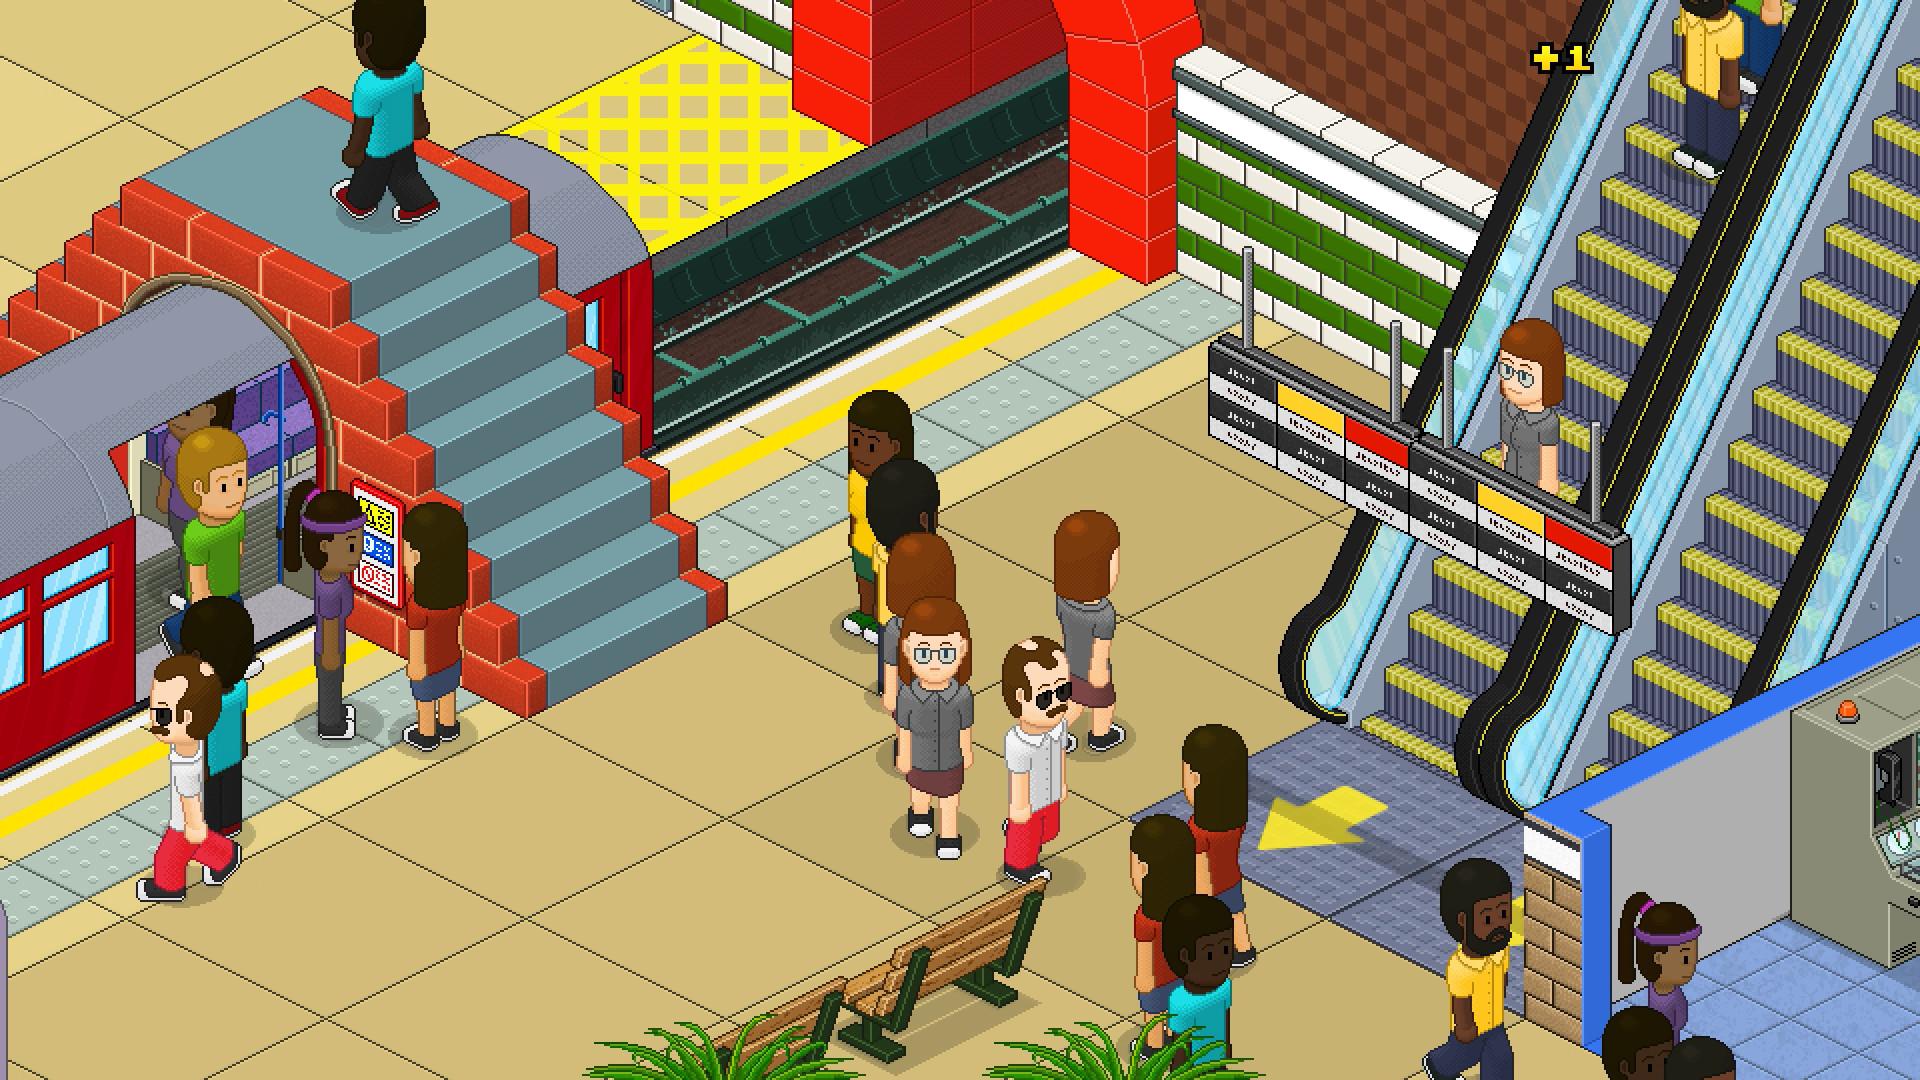 通勤:地铁站/Overcrowd: A Commute Em Up插图4